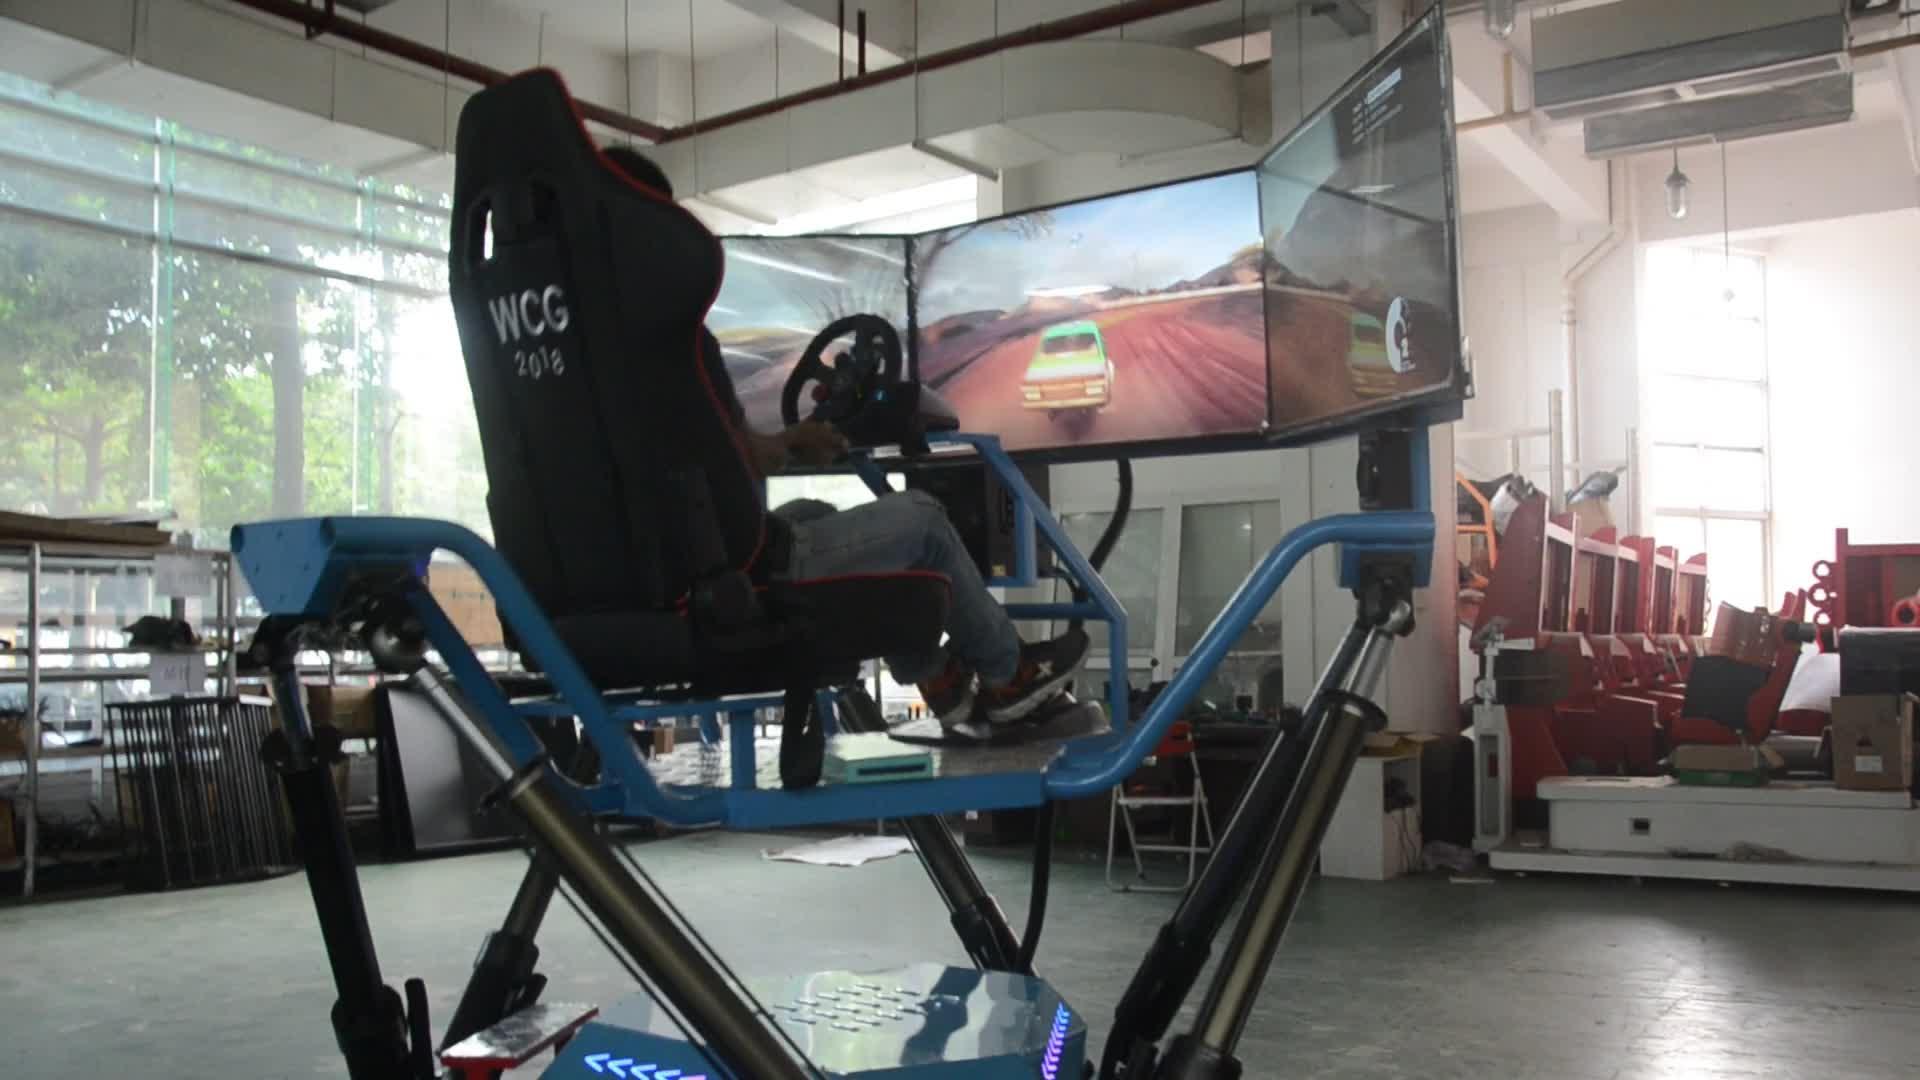 Christmas day promotion amusemen park simulator Six-axis-Dynamic-Car XD VR Racing car game machine driving simulator price